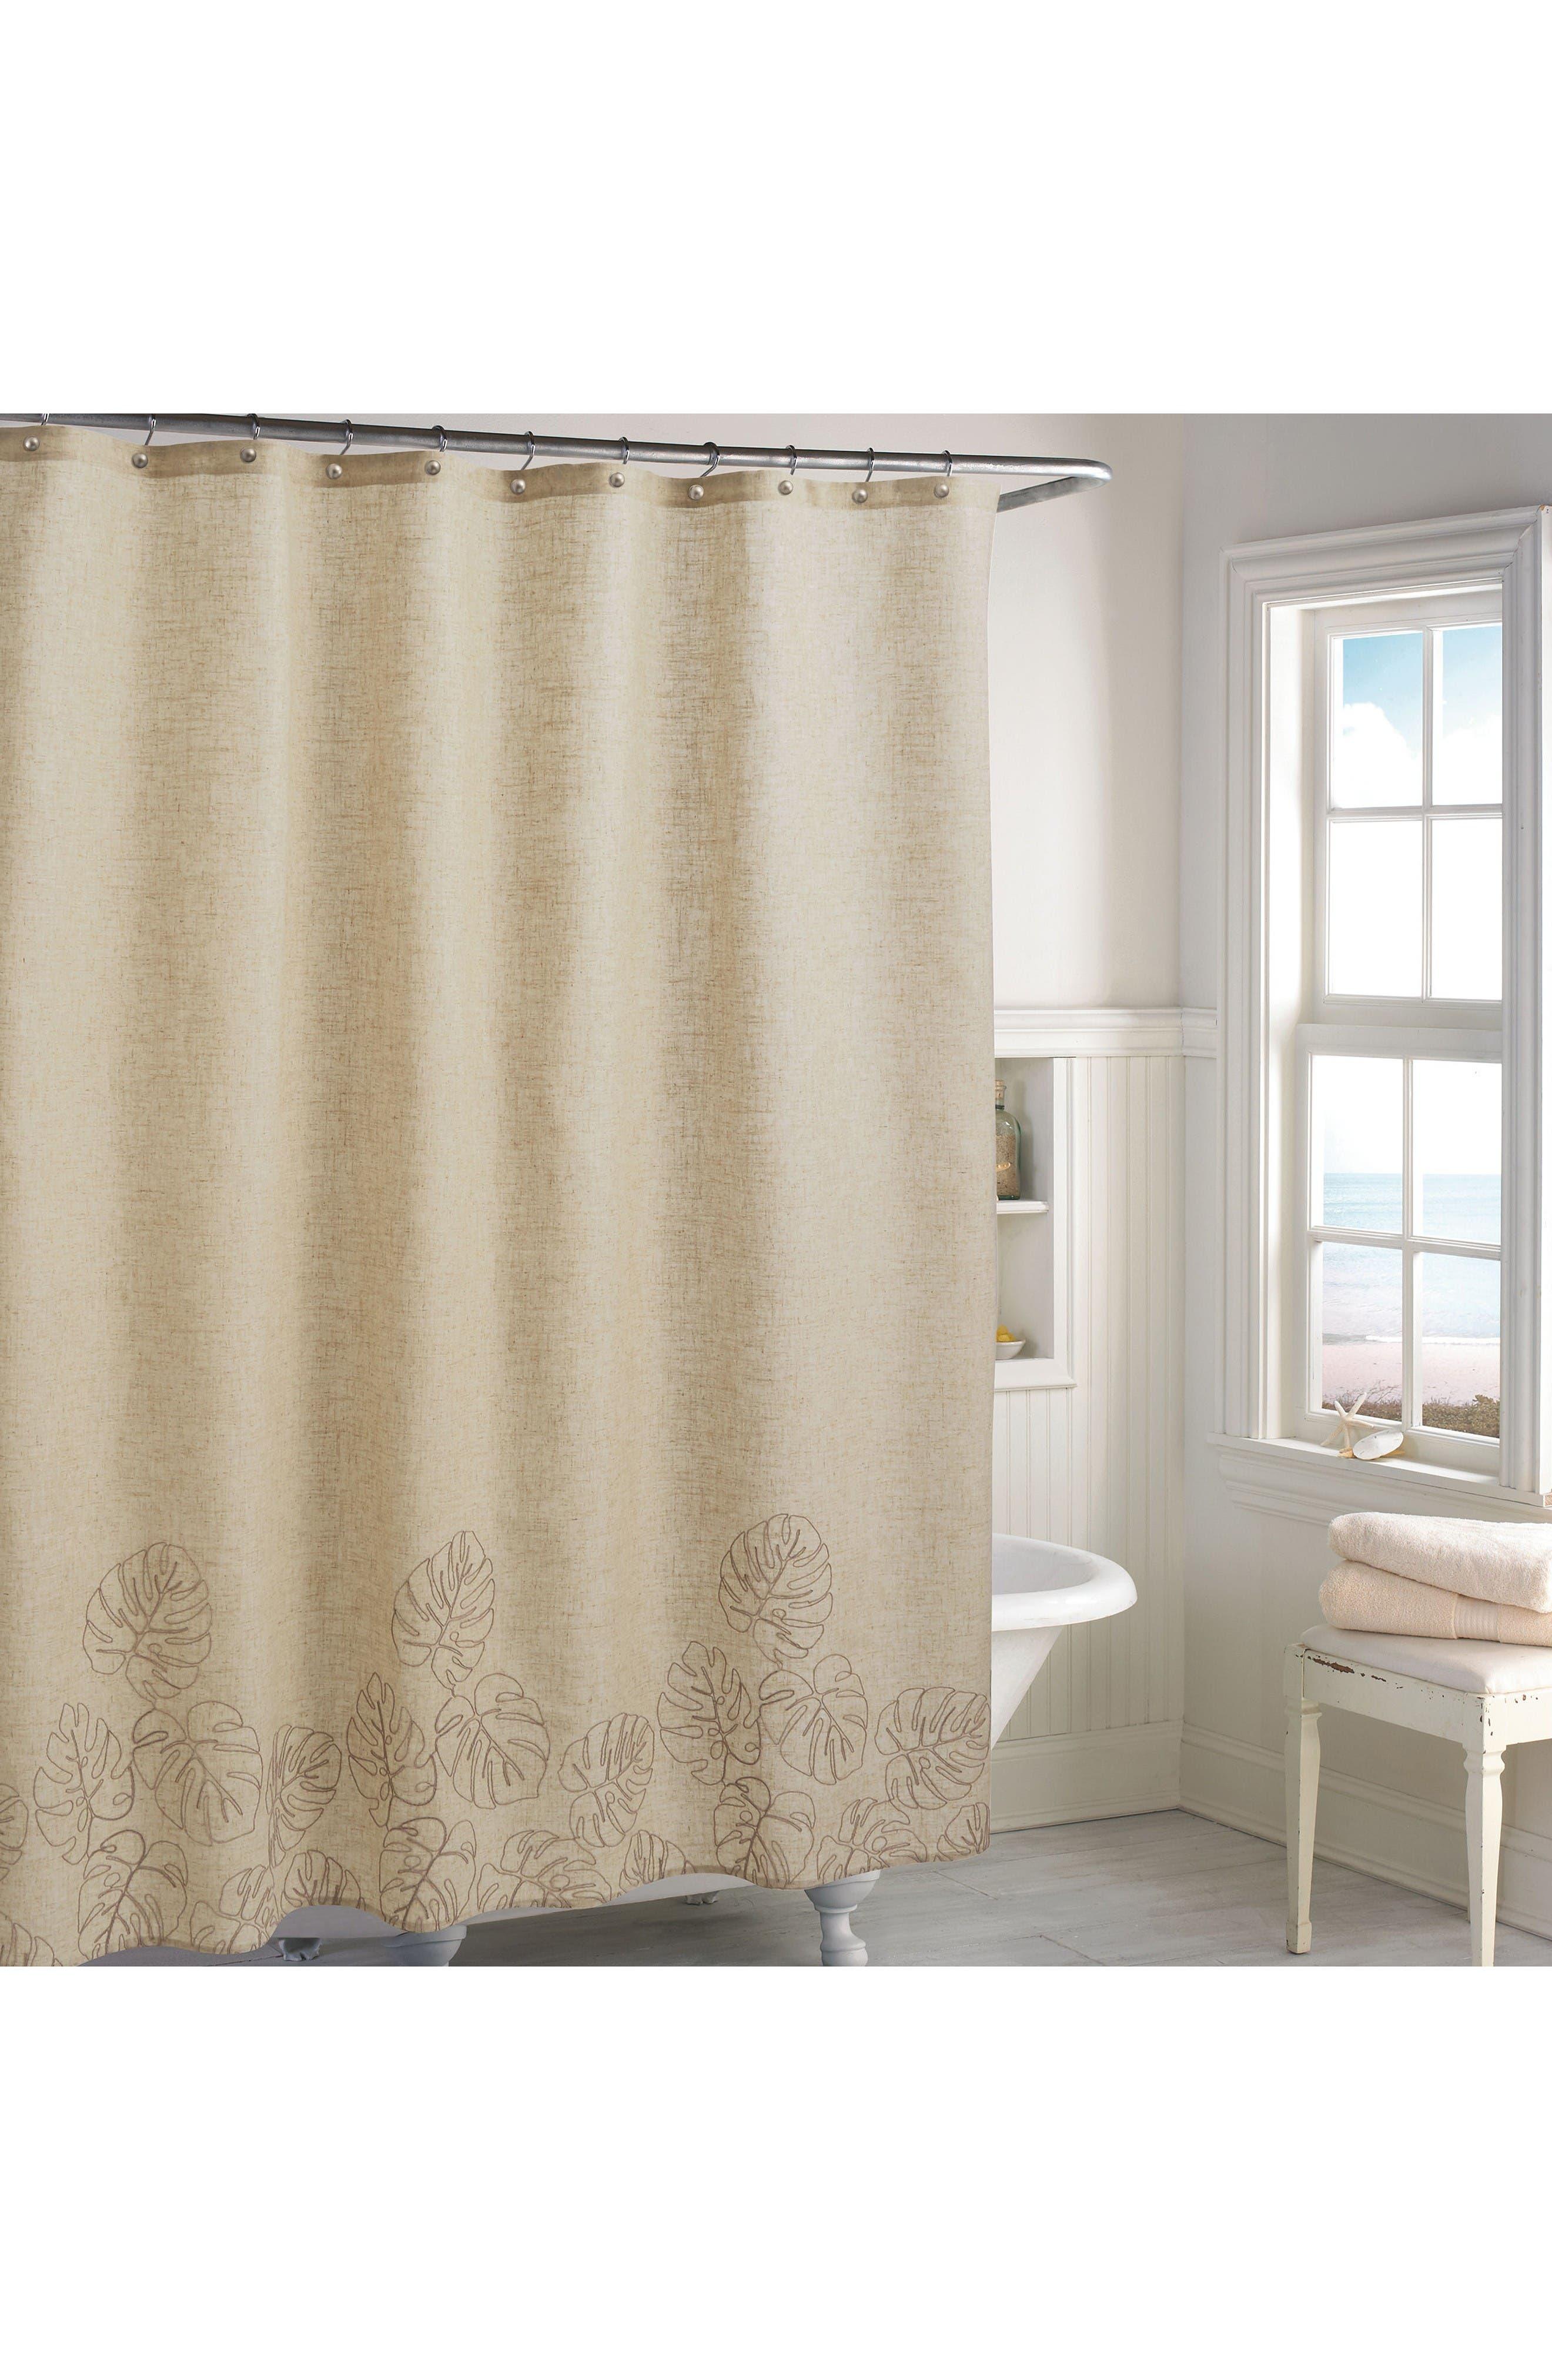 Main Image - Destinations Panama Shower Curtain